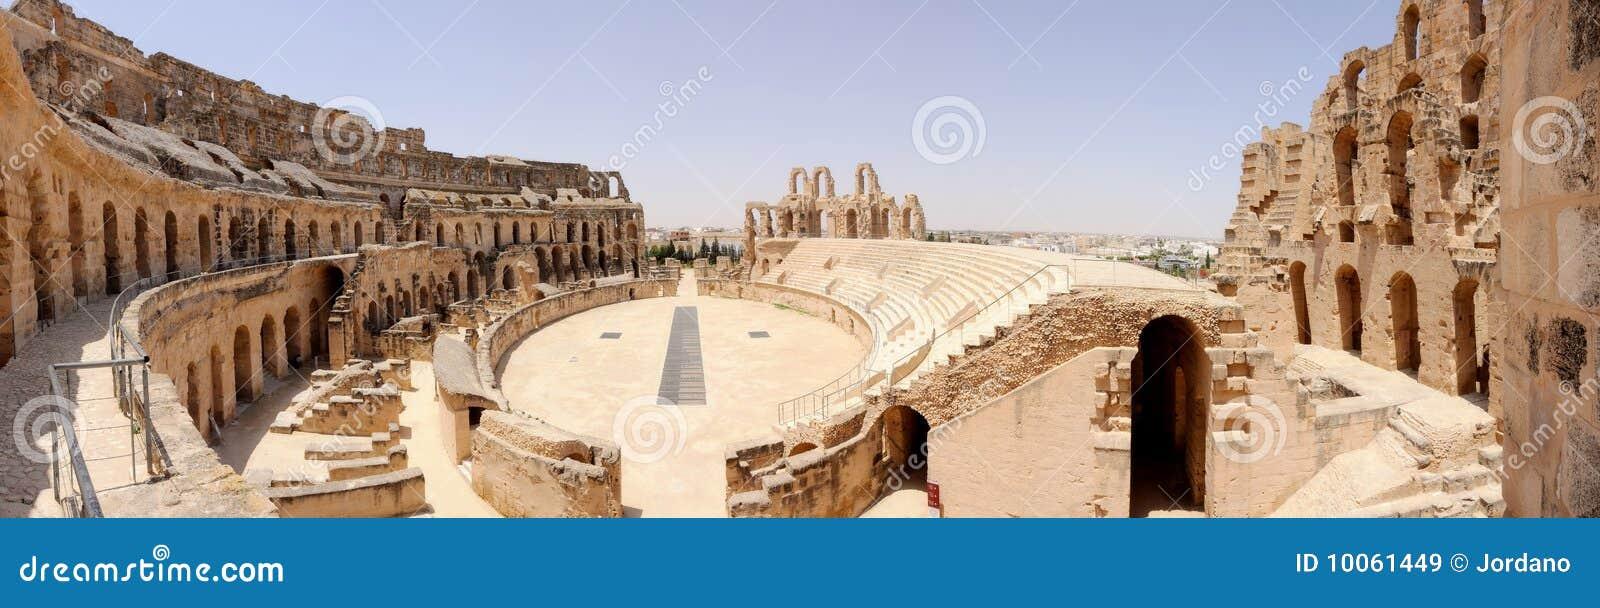 Amphitheatre em EL-Jem, Tunísia